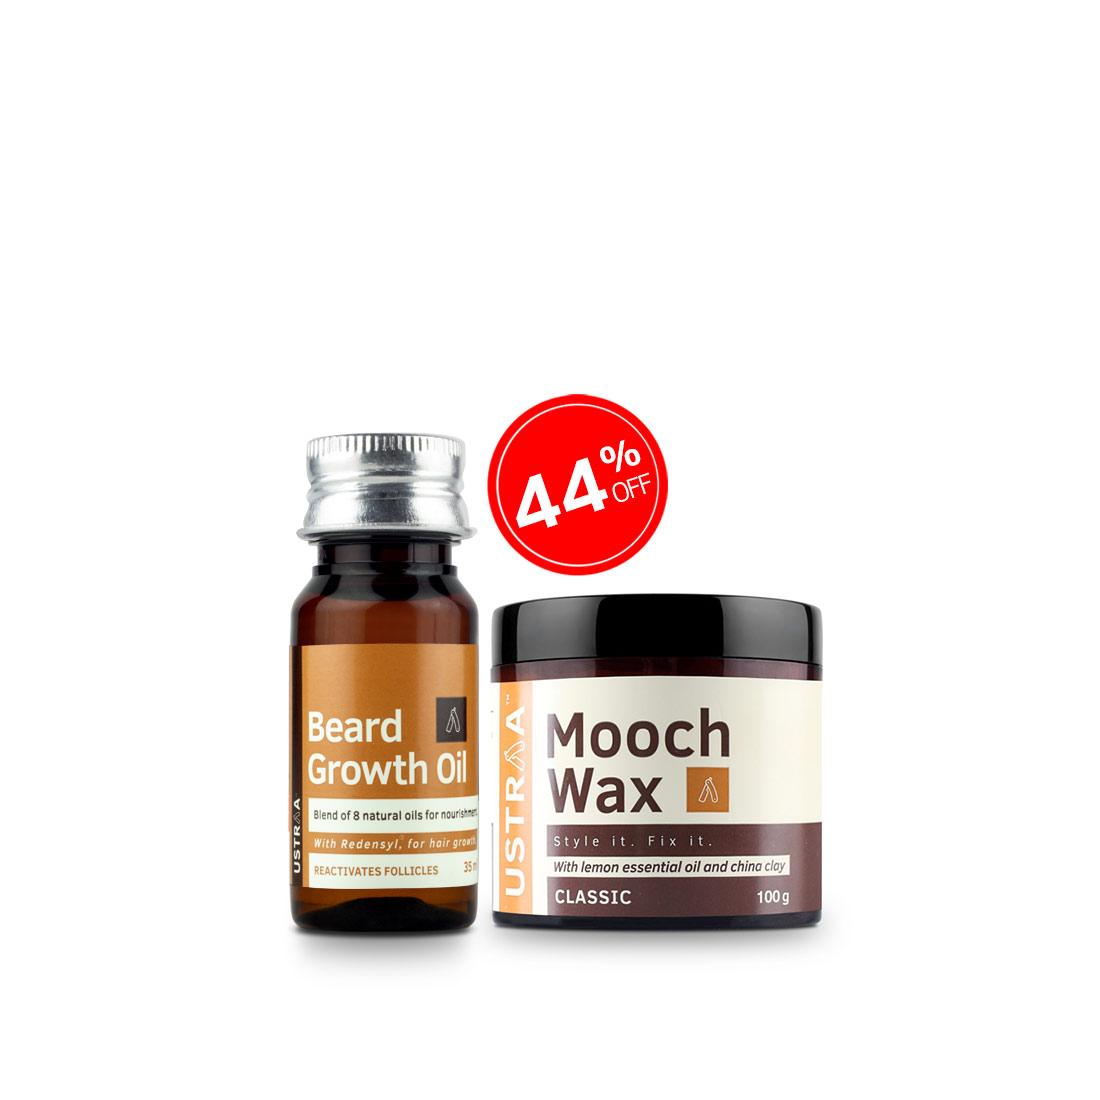 Beard Growth Oil and Beard & Mooch Styling Wax